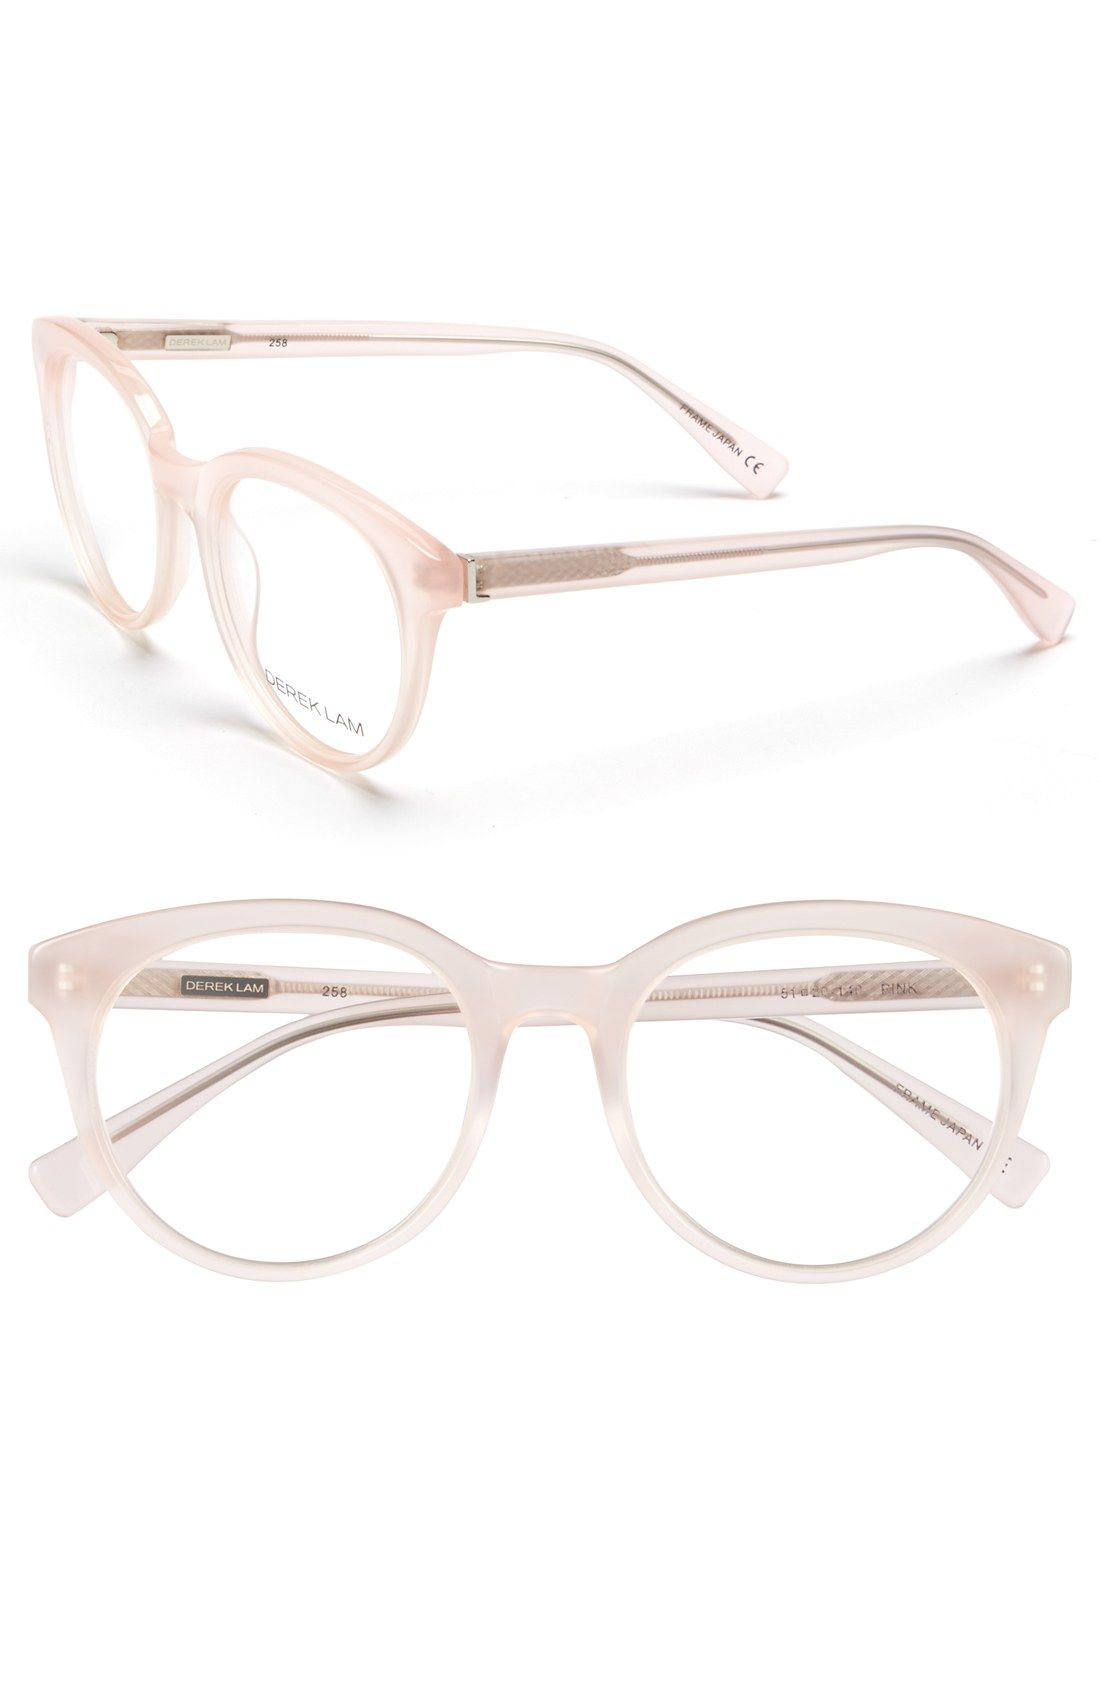 51mm Optical Glasses | Lentes, Gafas y Lentes de sol